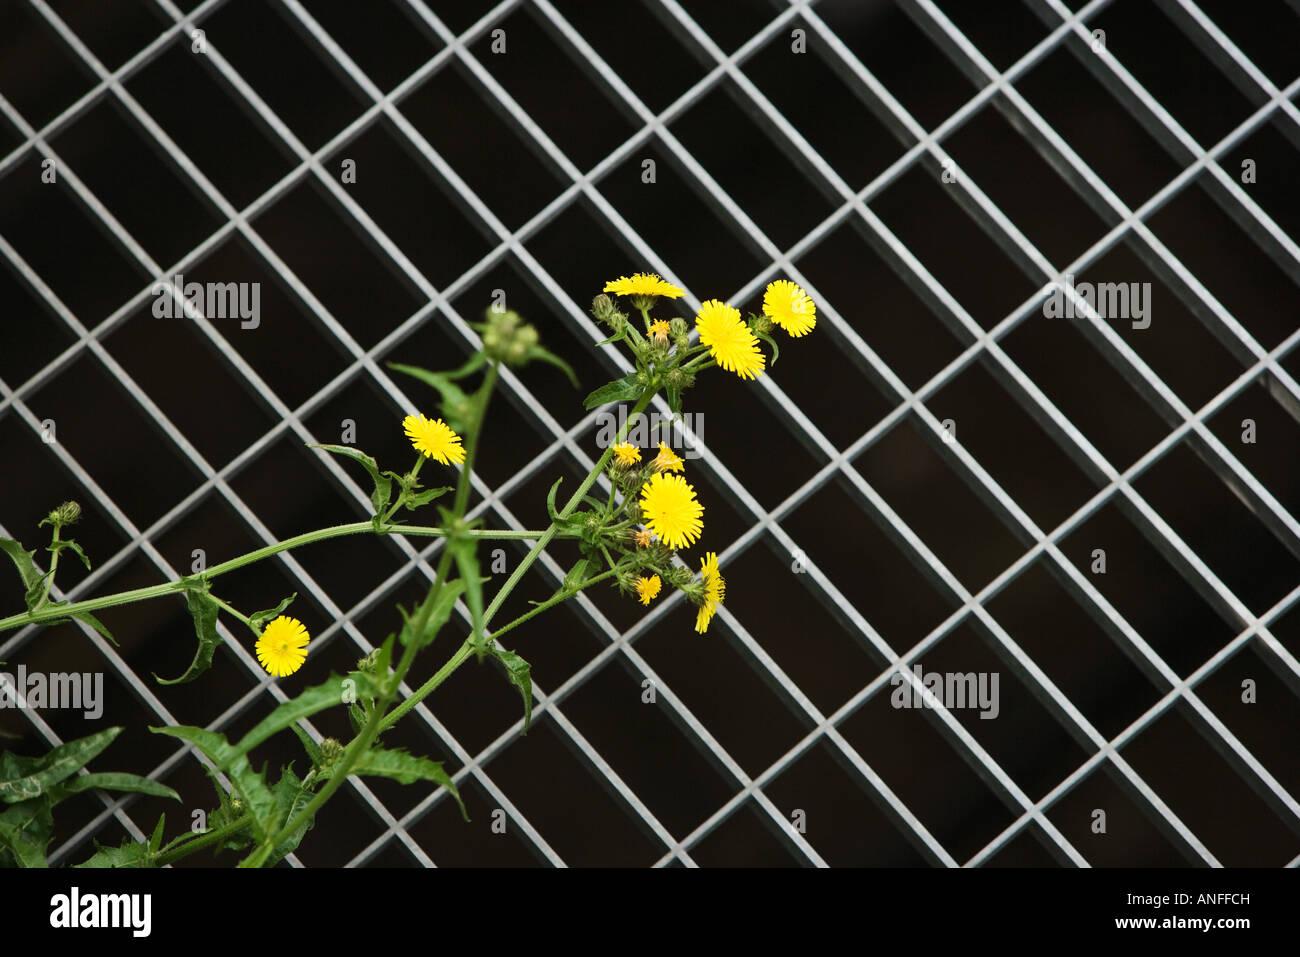 Dandelions and metal grate - Stock Image